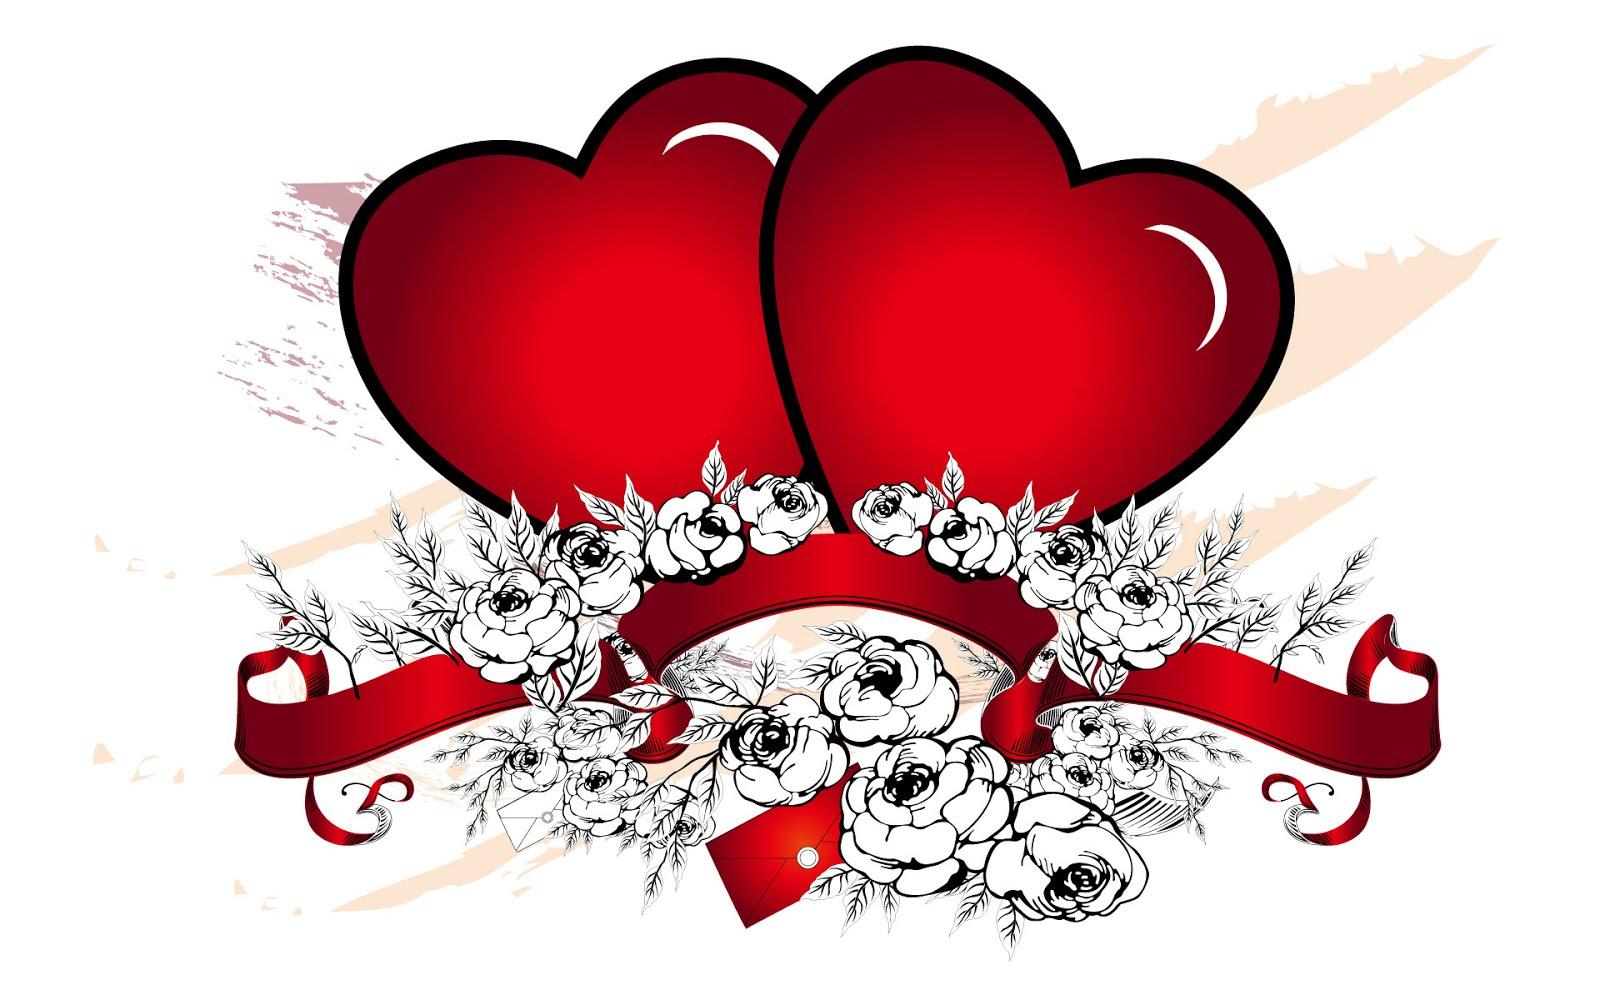 Сердечки к дню святого валентина